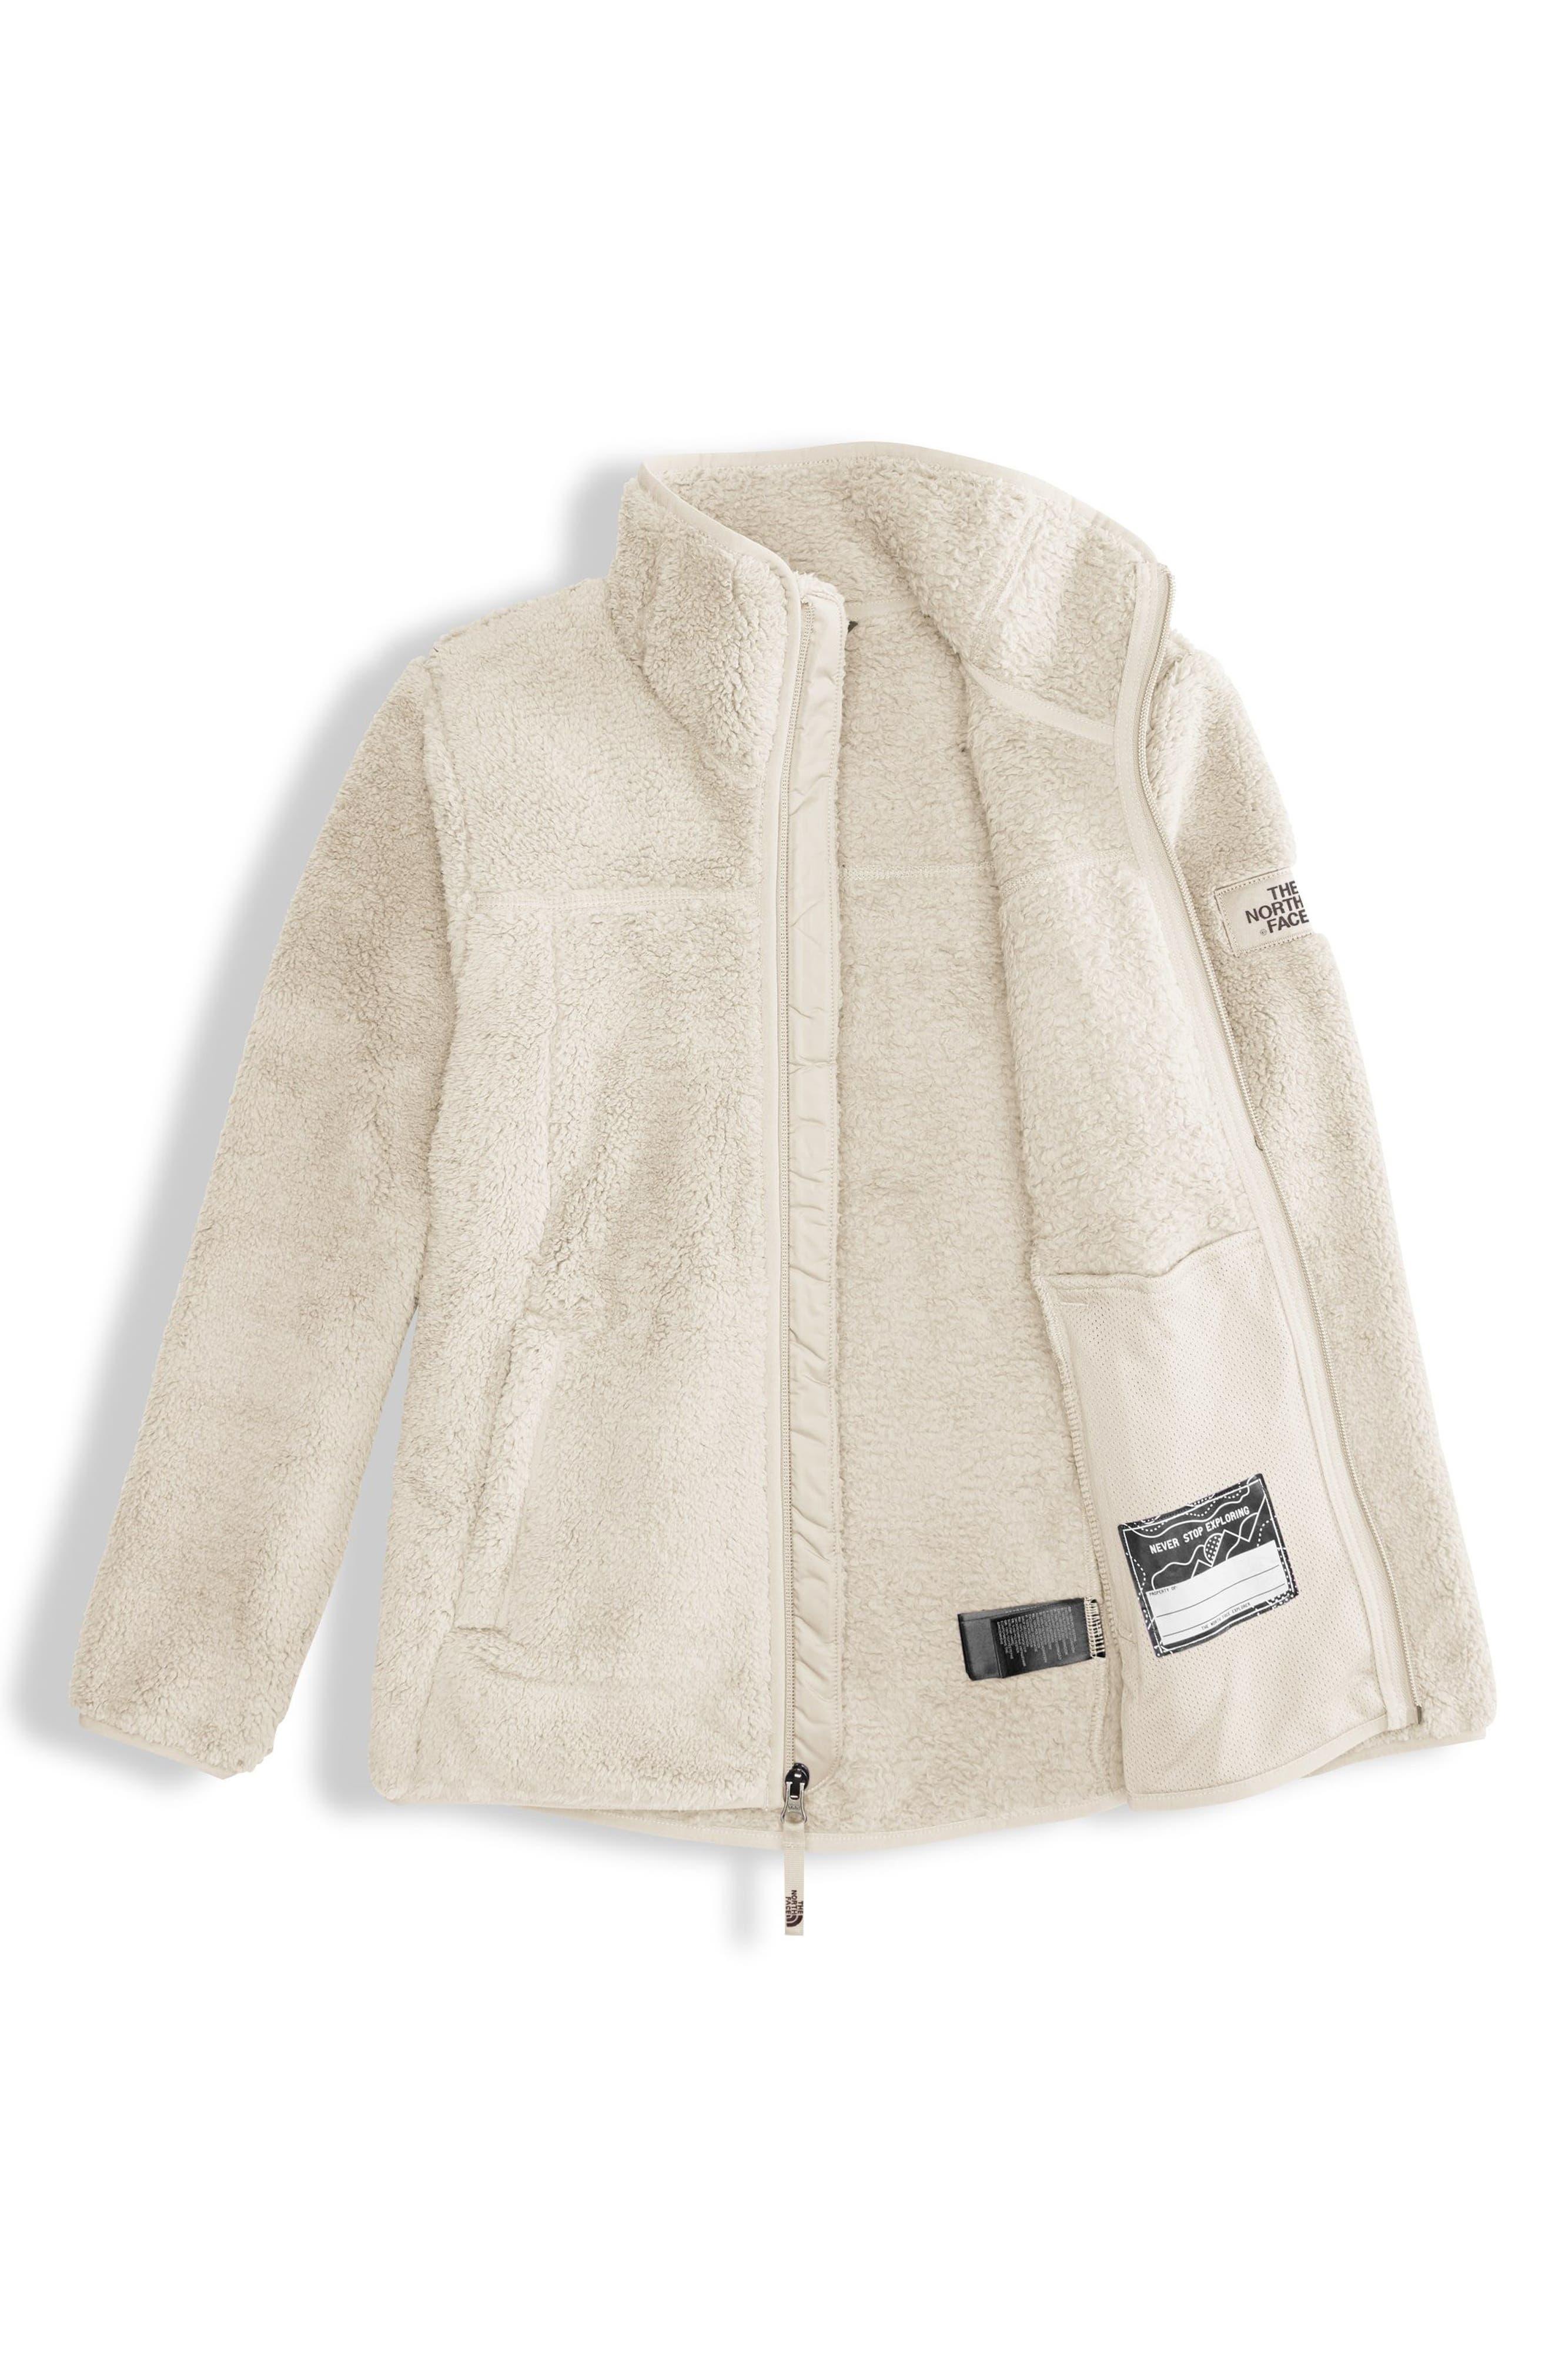 Campshire Fleece Jacket,                             Alternate thumbnail 2, color,                             VINTAGE WHITE